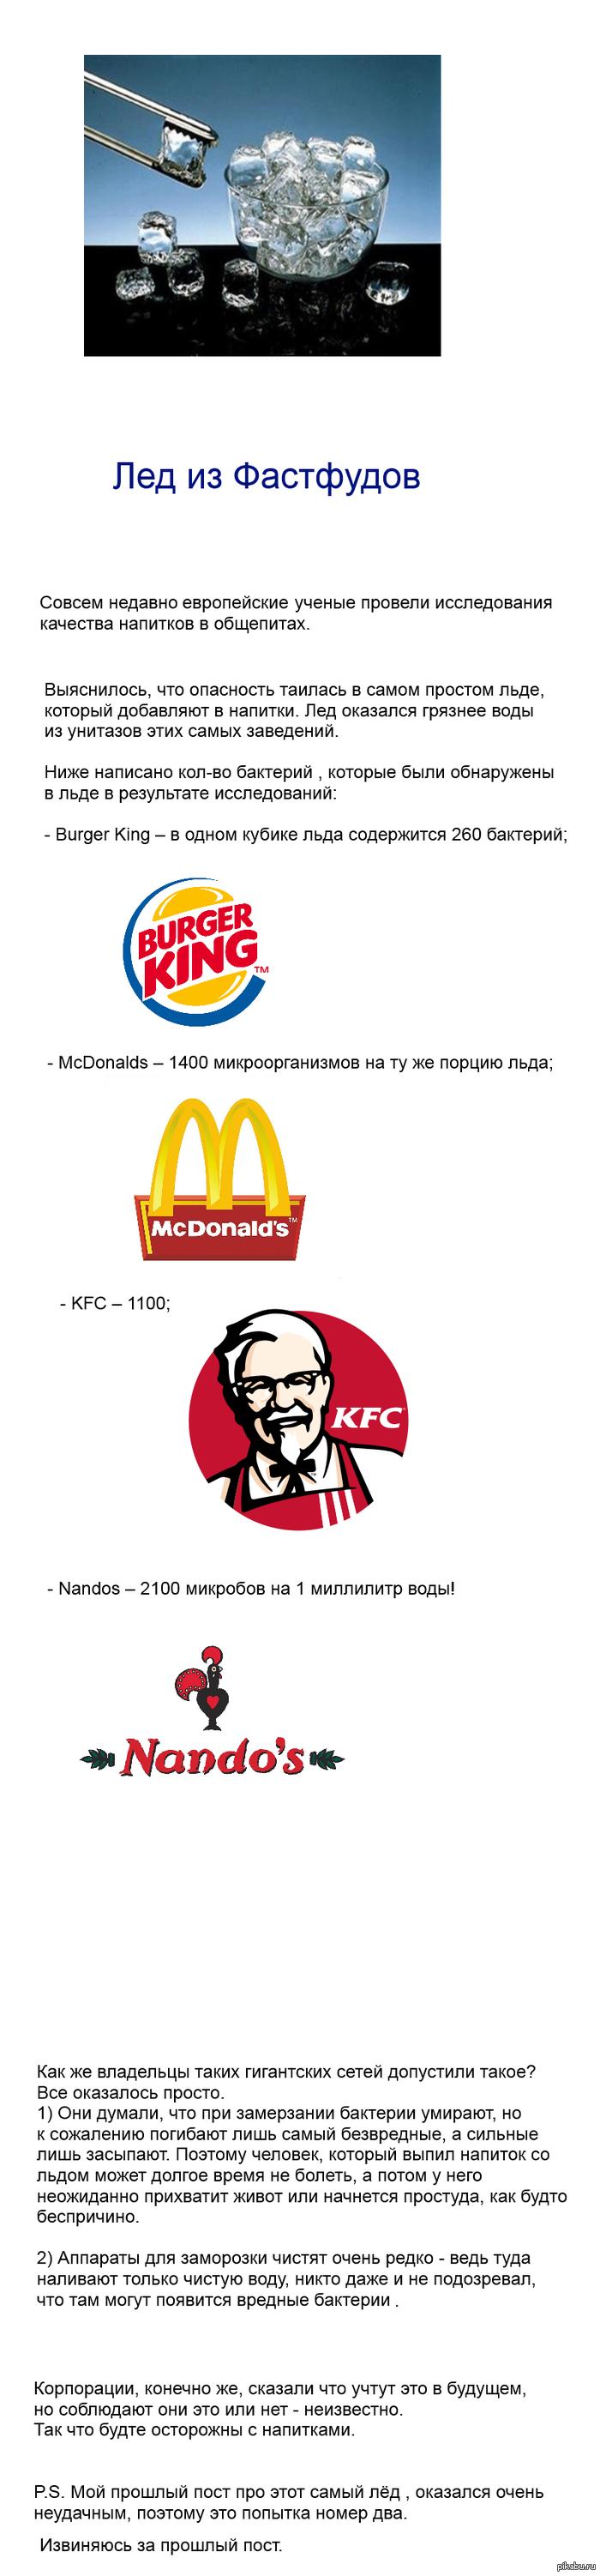 kfc vs nandos marketing strategy